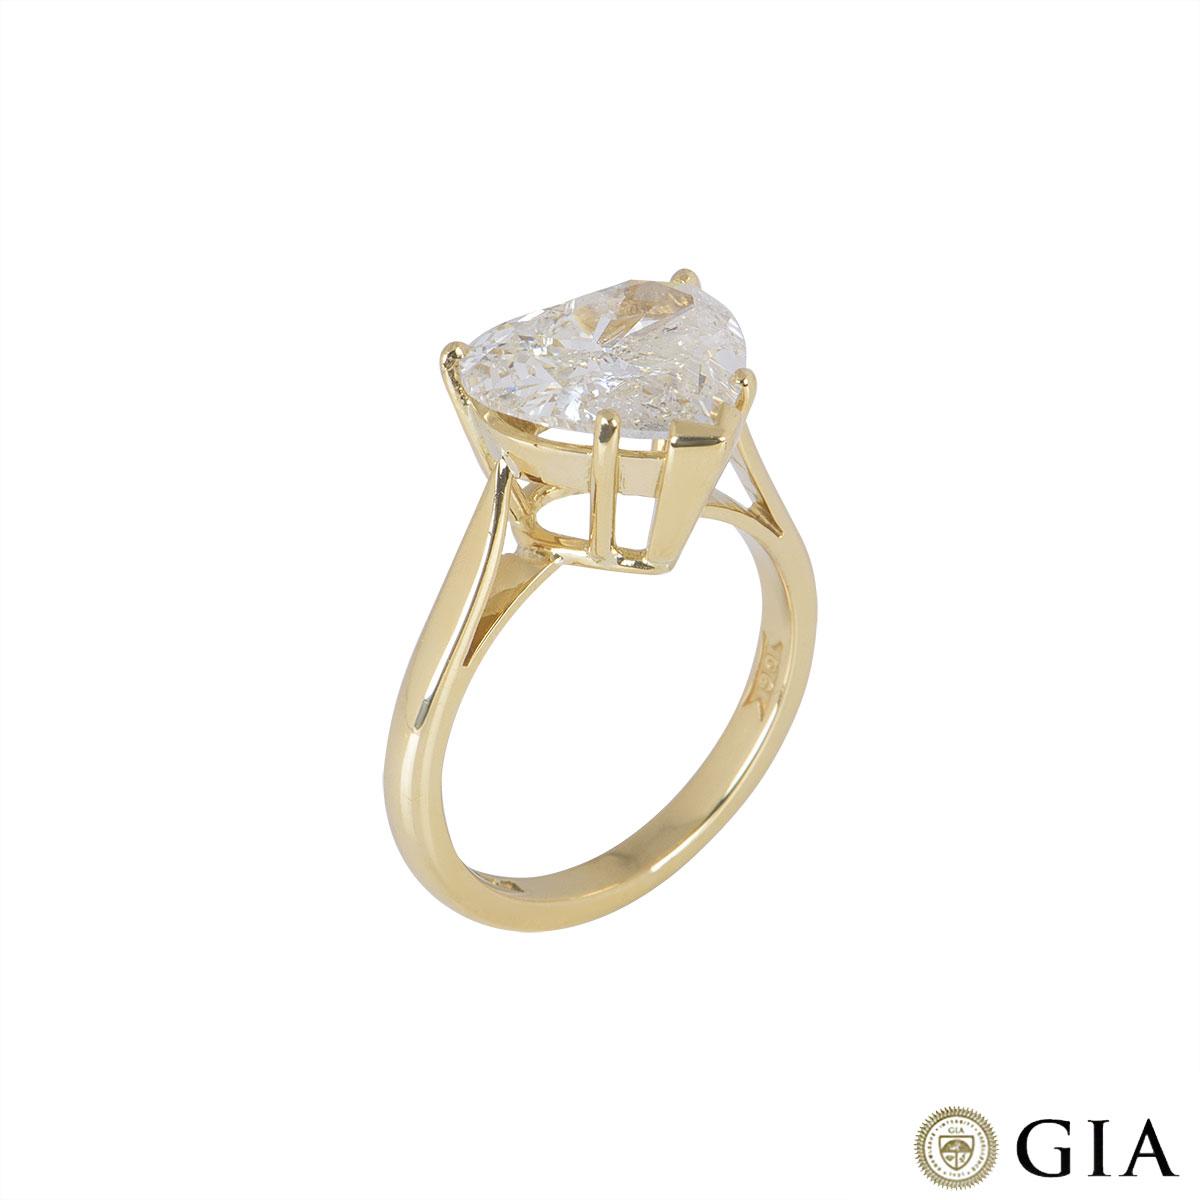 Yellow Gold Heart Cut Diamond Ring 2.83ct L/I2